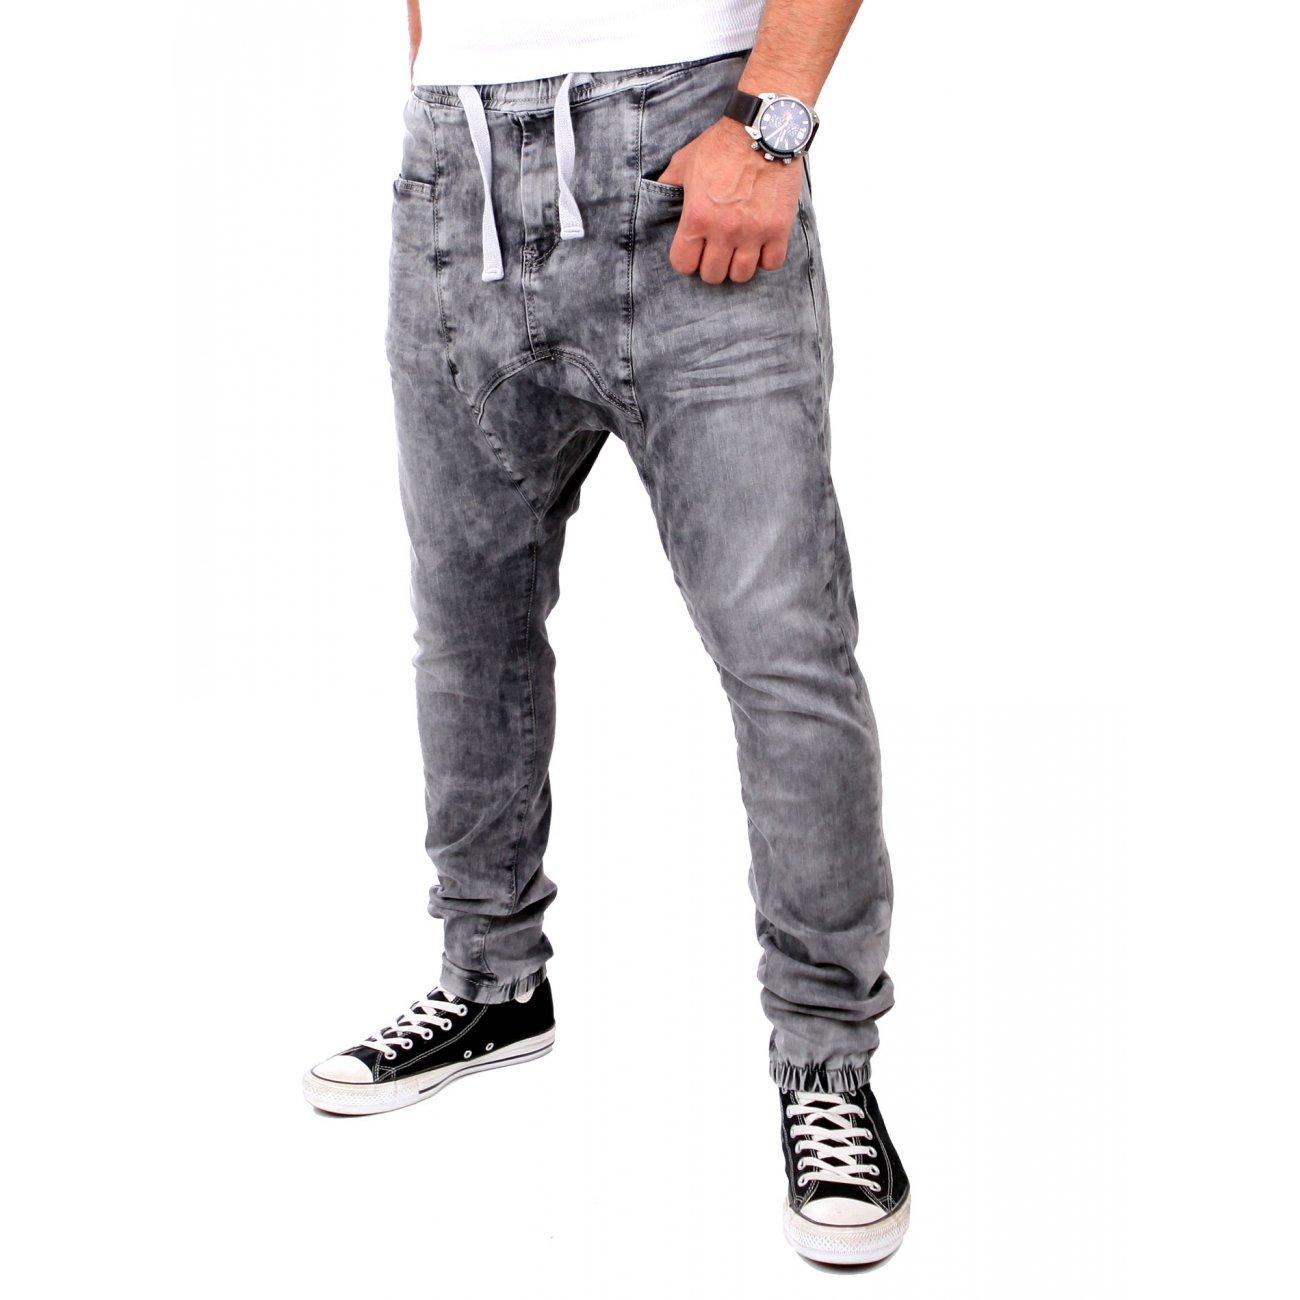 jogg jeans von rerock jeans jogginghose low crotch grau. Black Bedroom Furniture Sets. Home Design Ideas